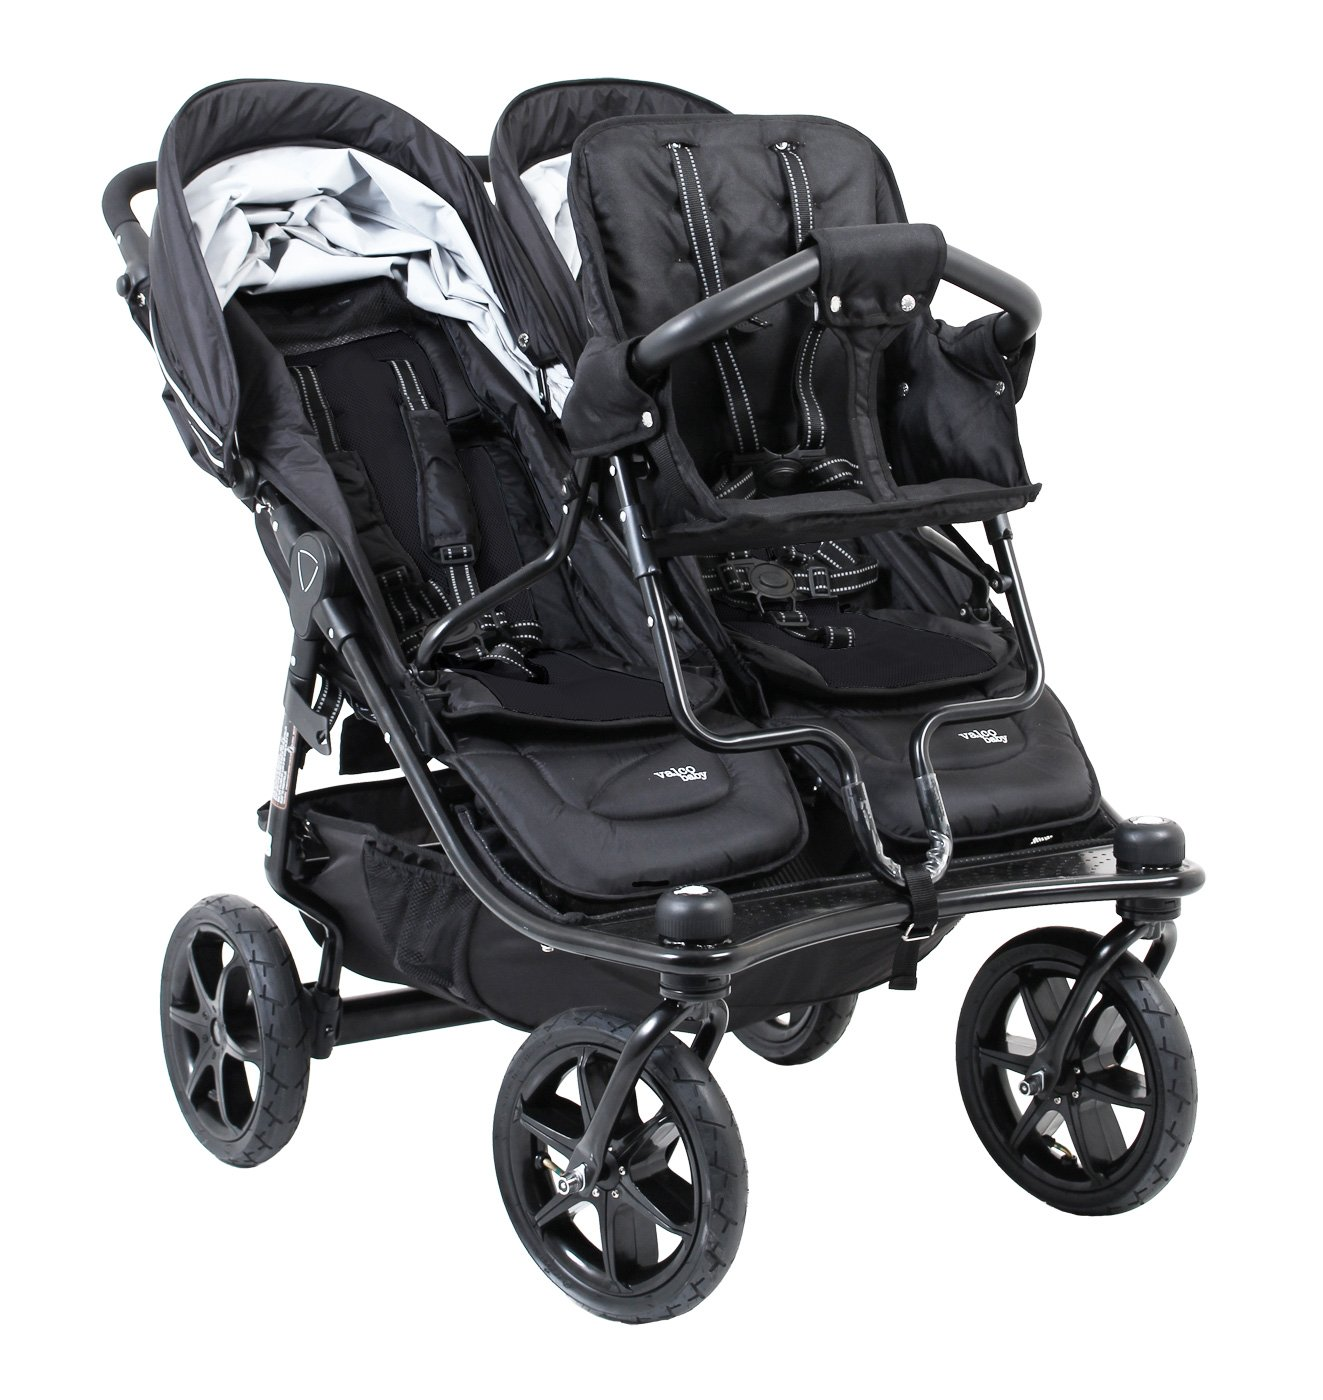 Valco Baby Tri Mode Duo X Toddler Seat (2016)